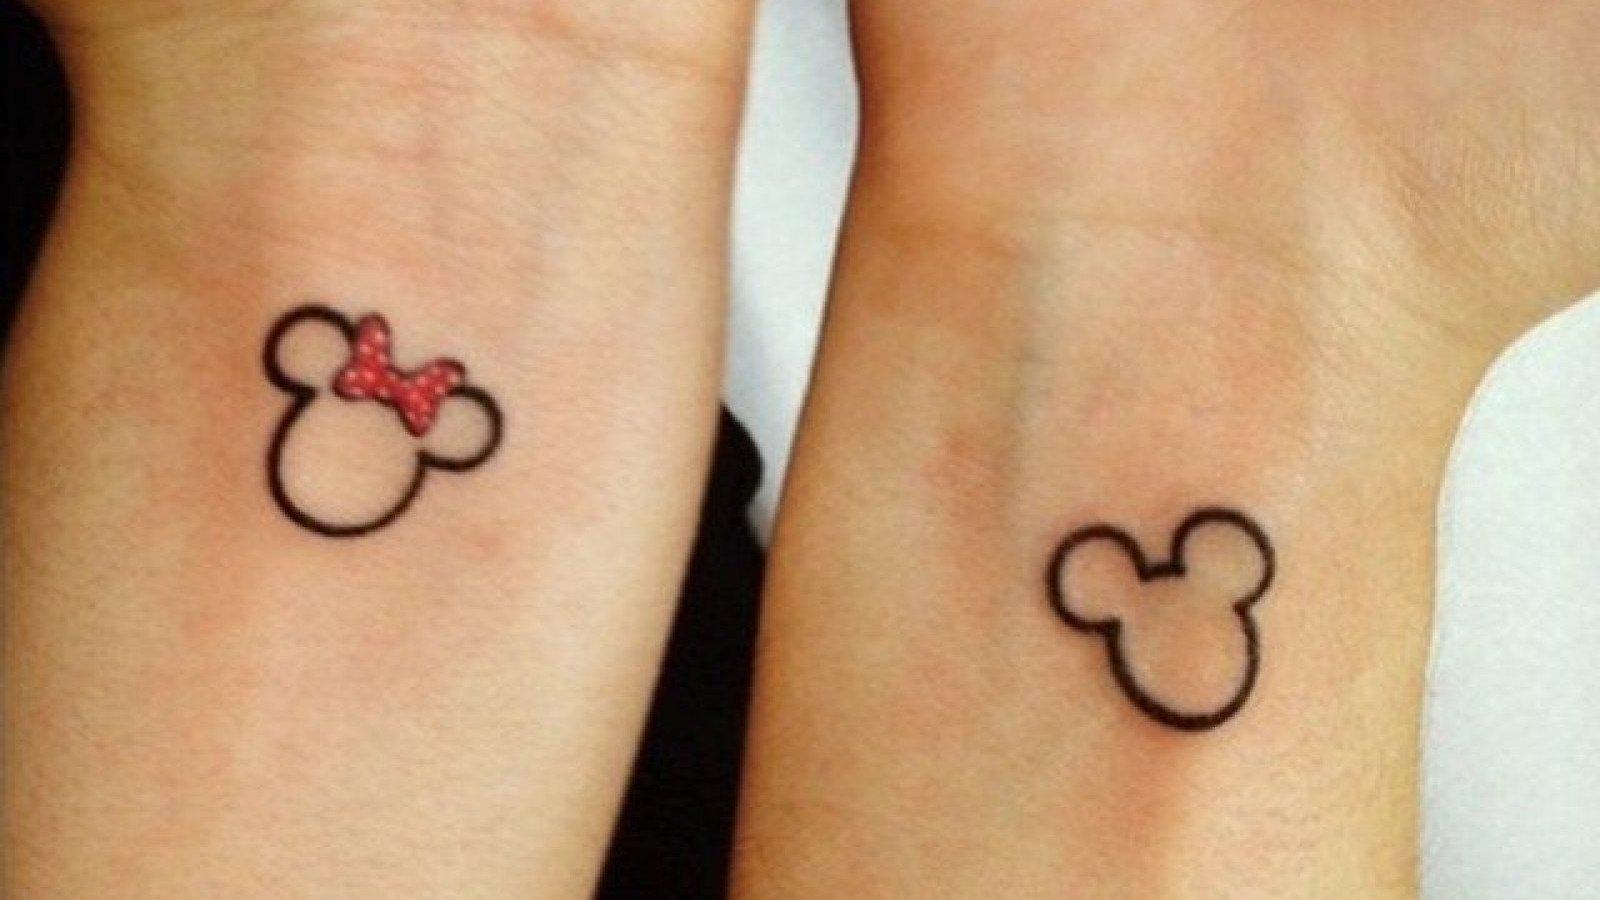 Tatuaje de la pareja de Minnie y Mickey Mouse.